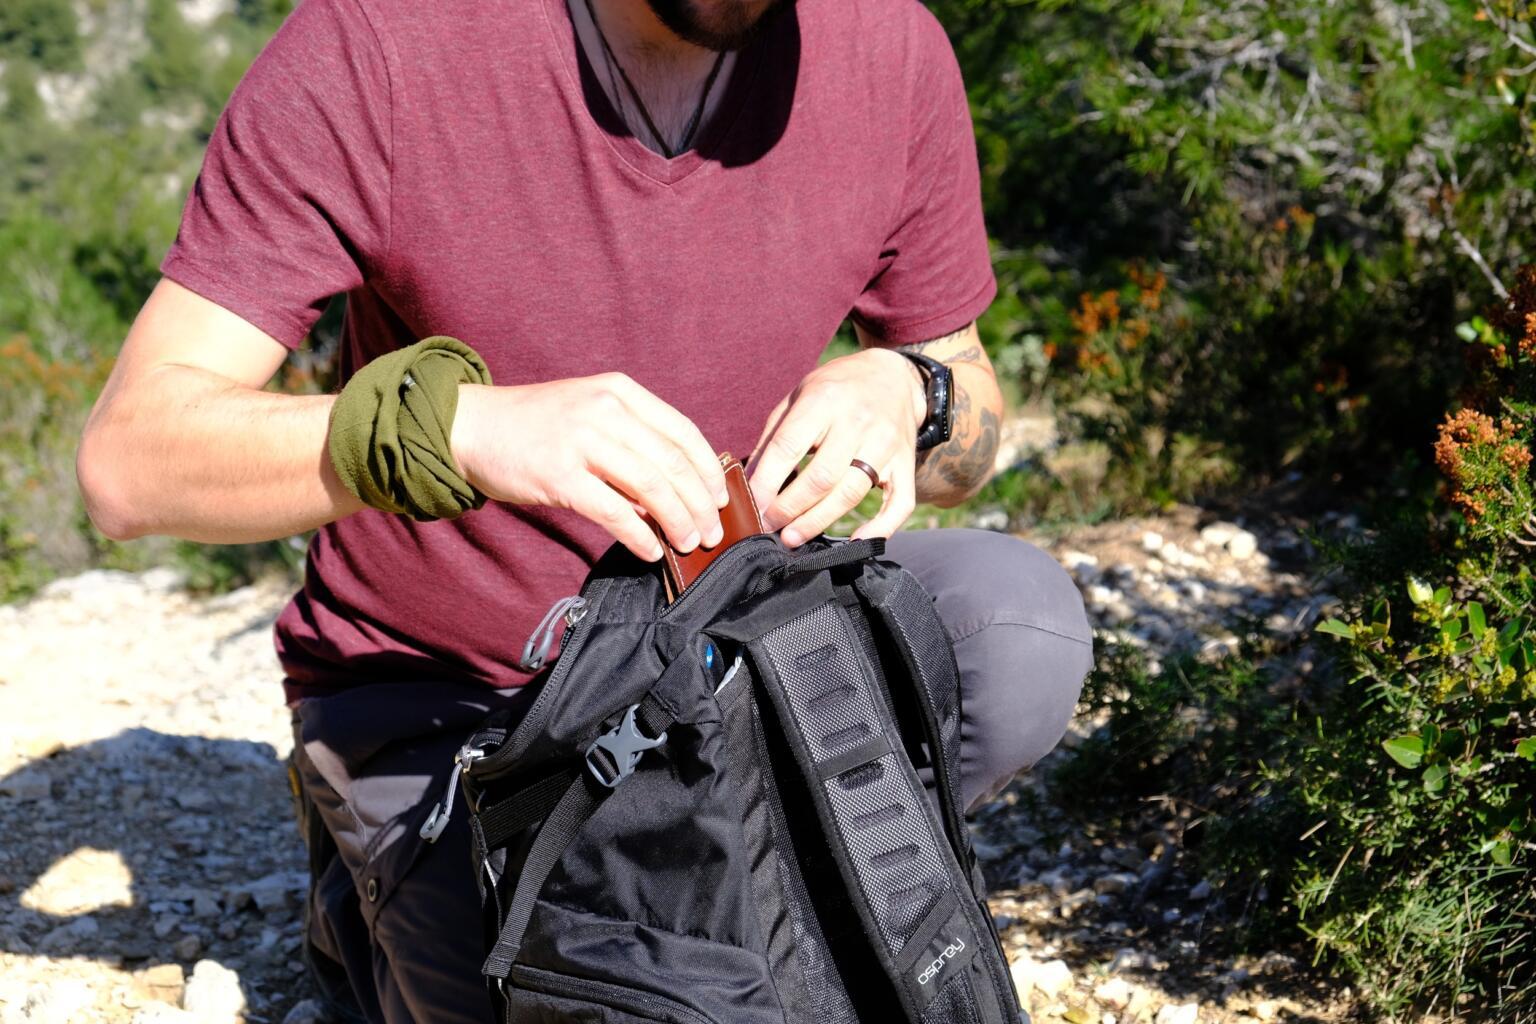 osprey skarab review